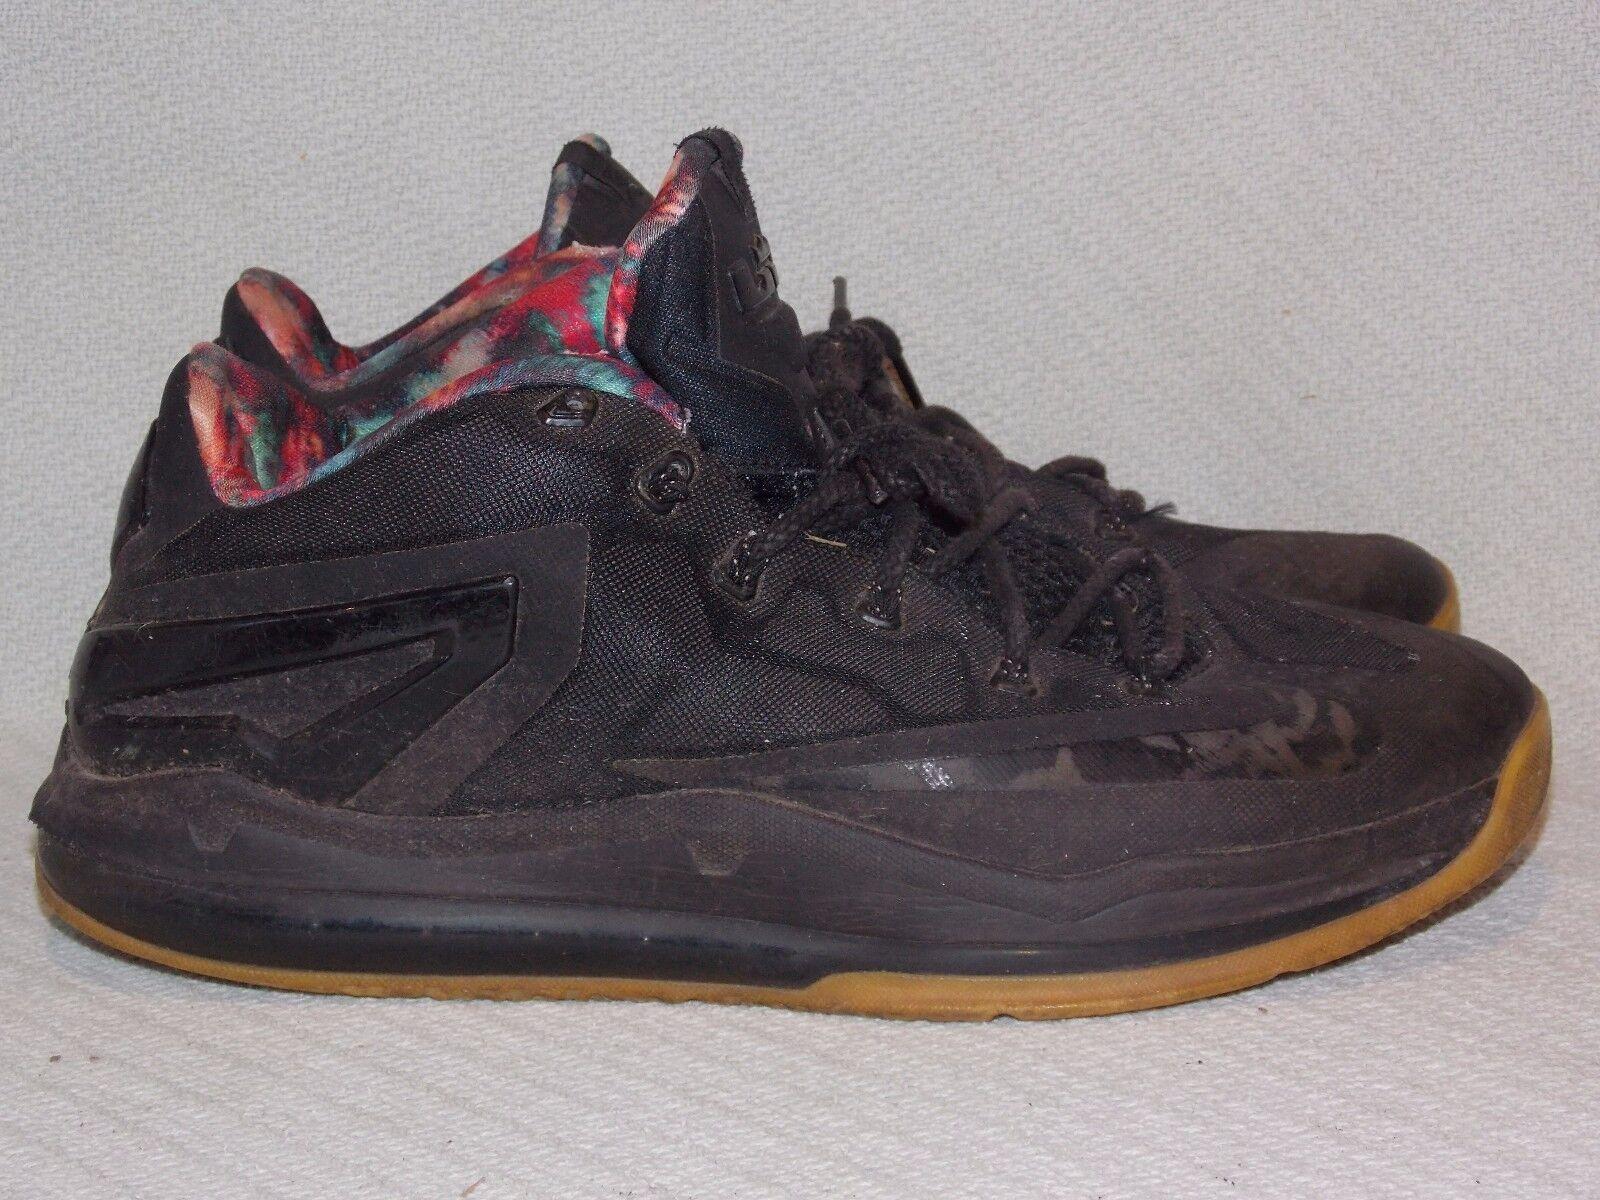 Nike Max Lebron XI Low 642849-078 Black/Black-Hypr Crimson-Hypr Cobalt Size 9.5